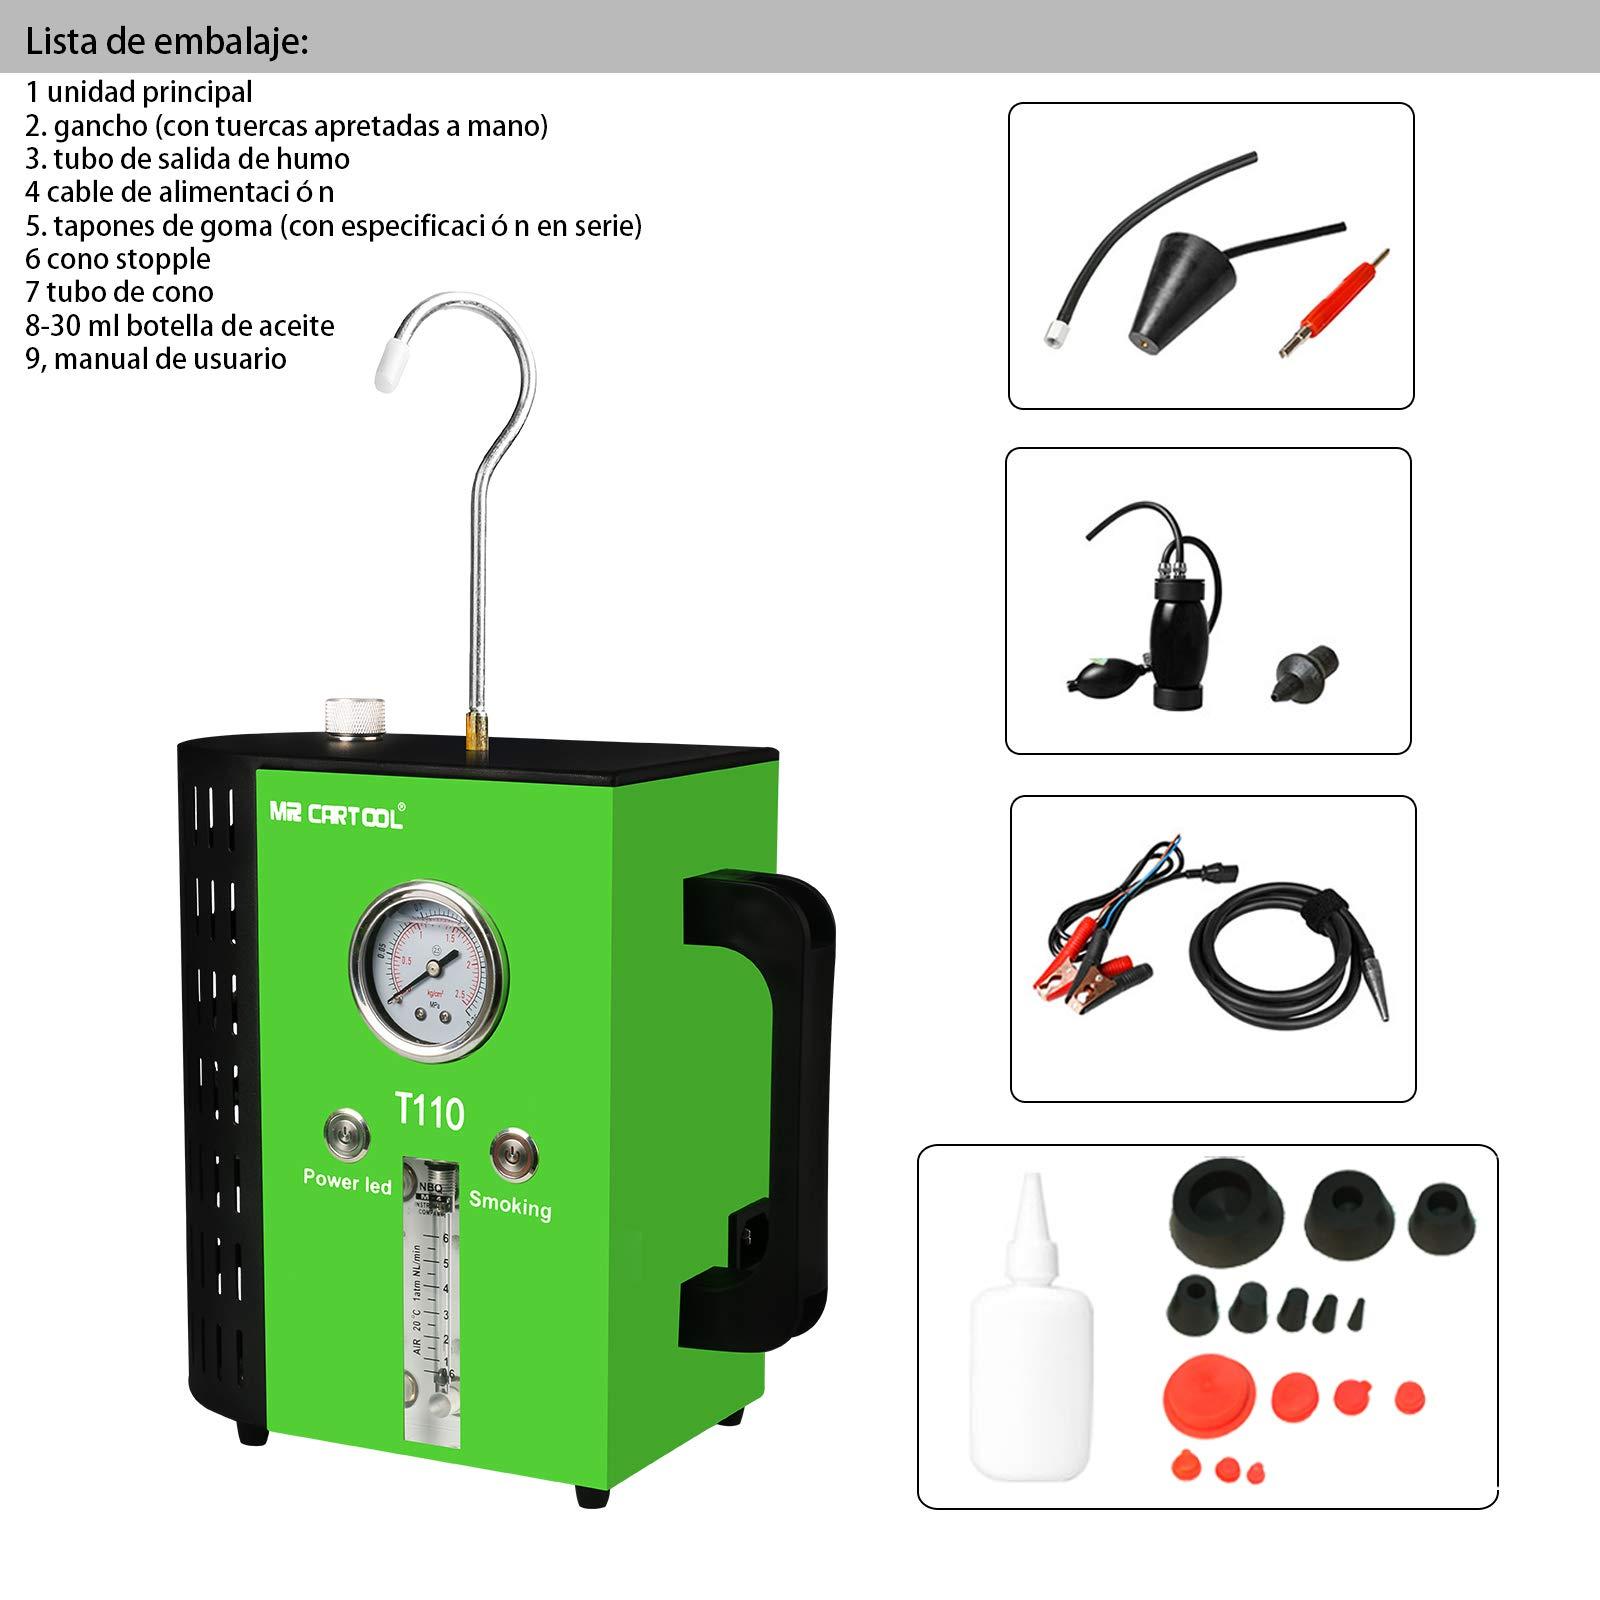 T110 12V Automotive Fuel Leak Detectors Cars Leak Locator Tester Car Fuel Leak Detectors Car Pipe Leakage Tester Support EVAP for All Vehicles by T110 (Image #9)